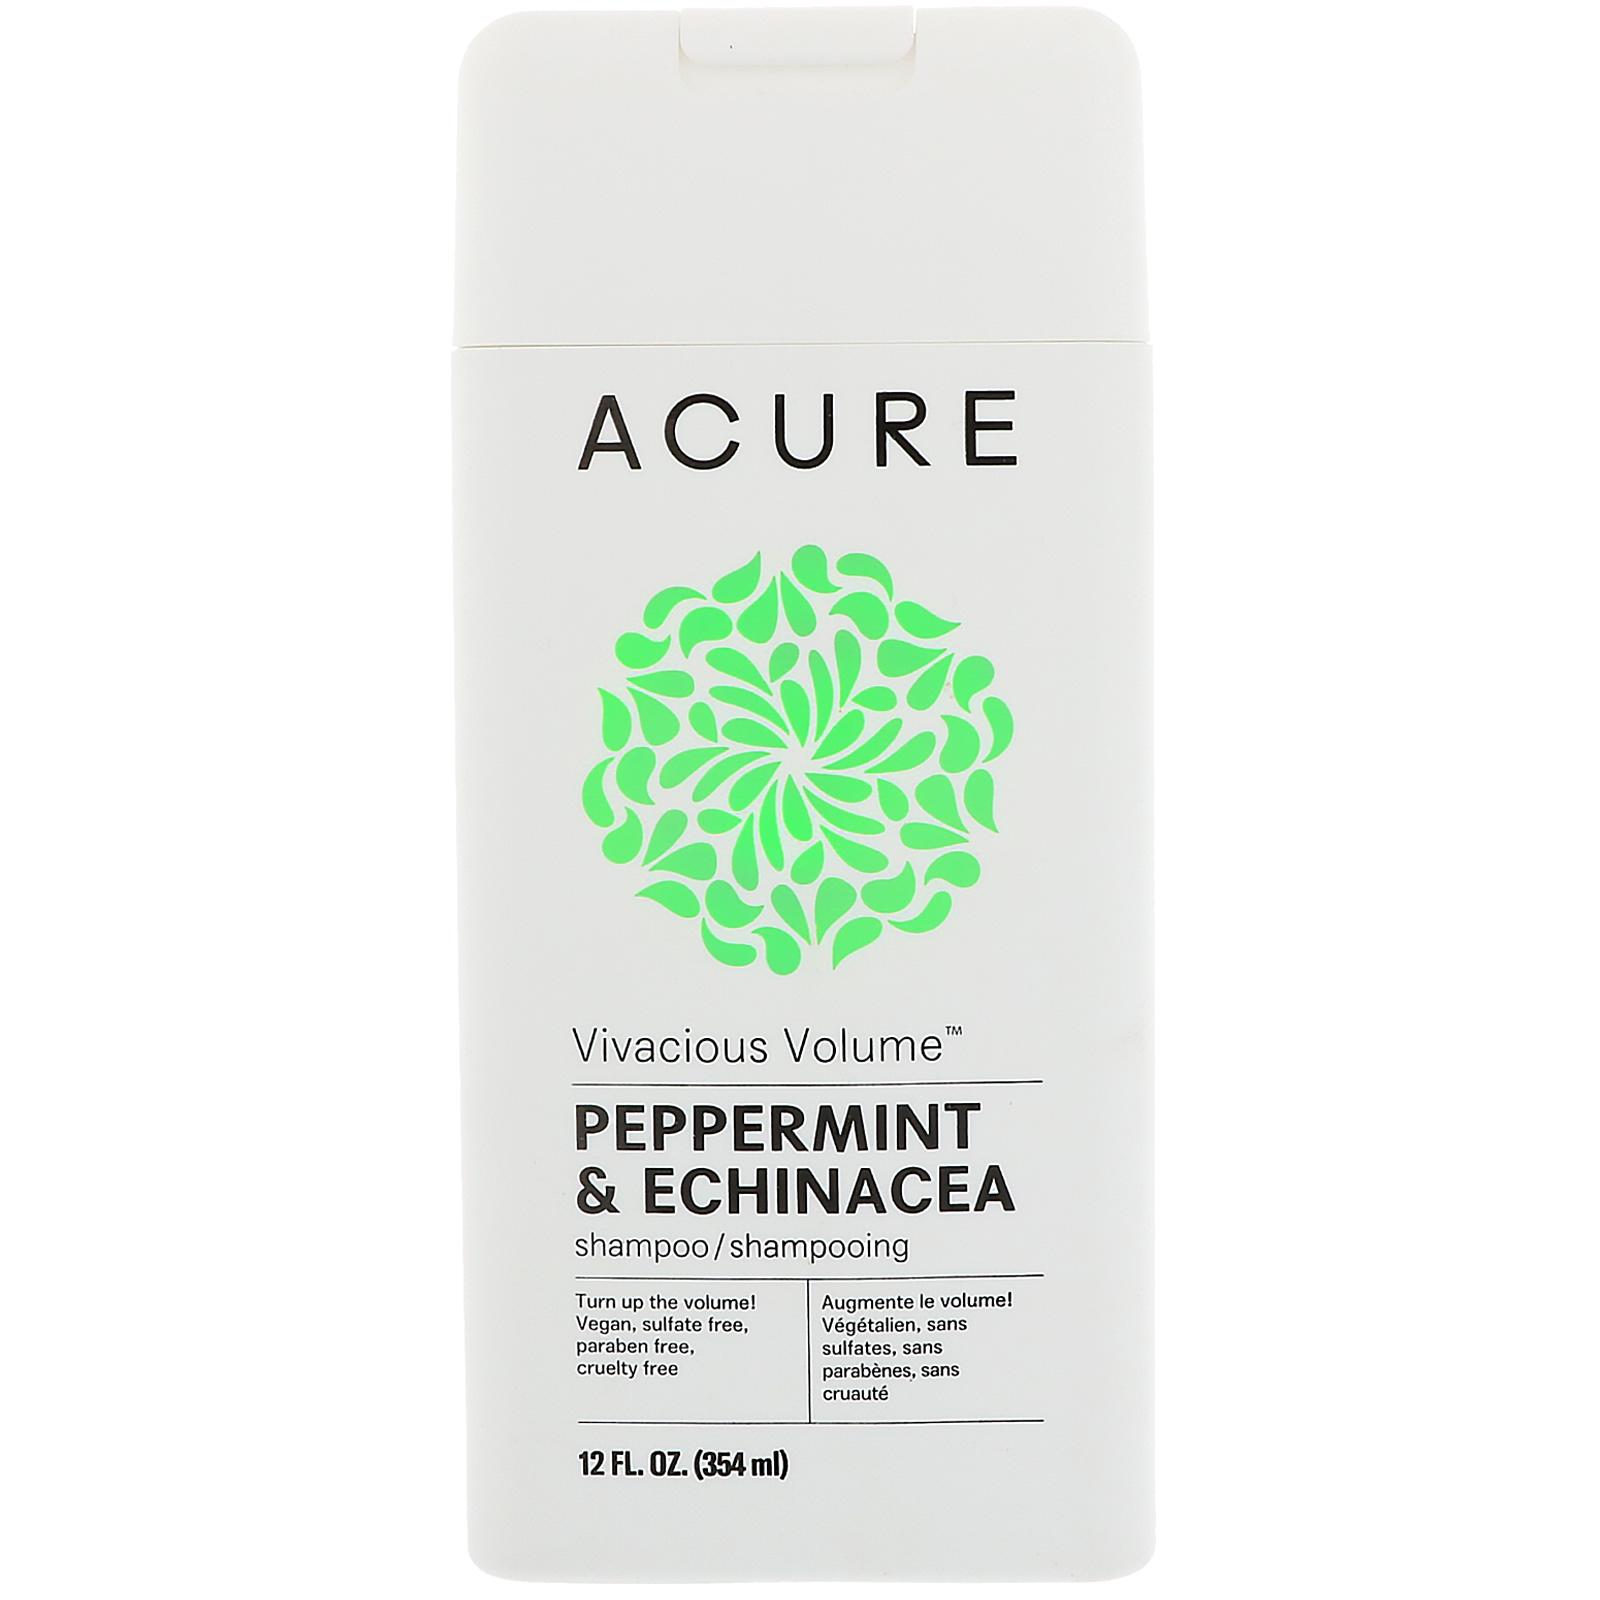 Acure, Vivacious Volume Shampoo, Peppermint & Echinacea